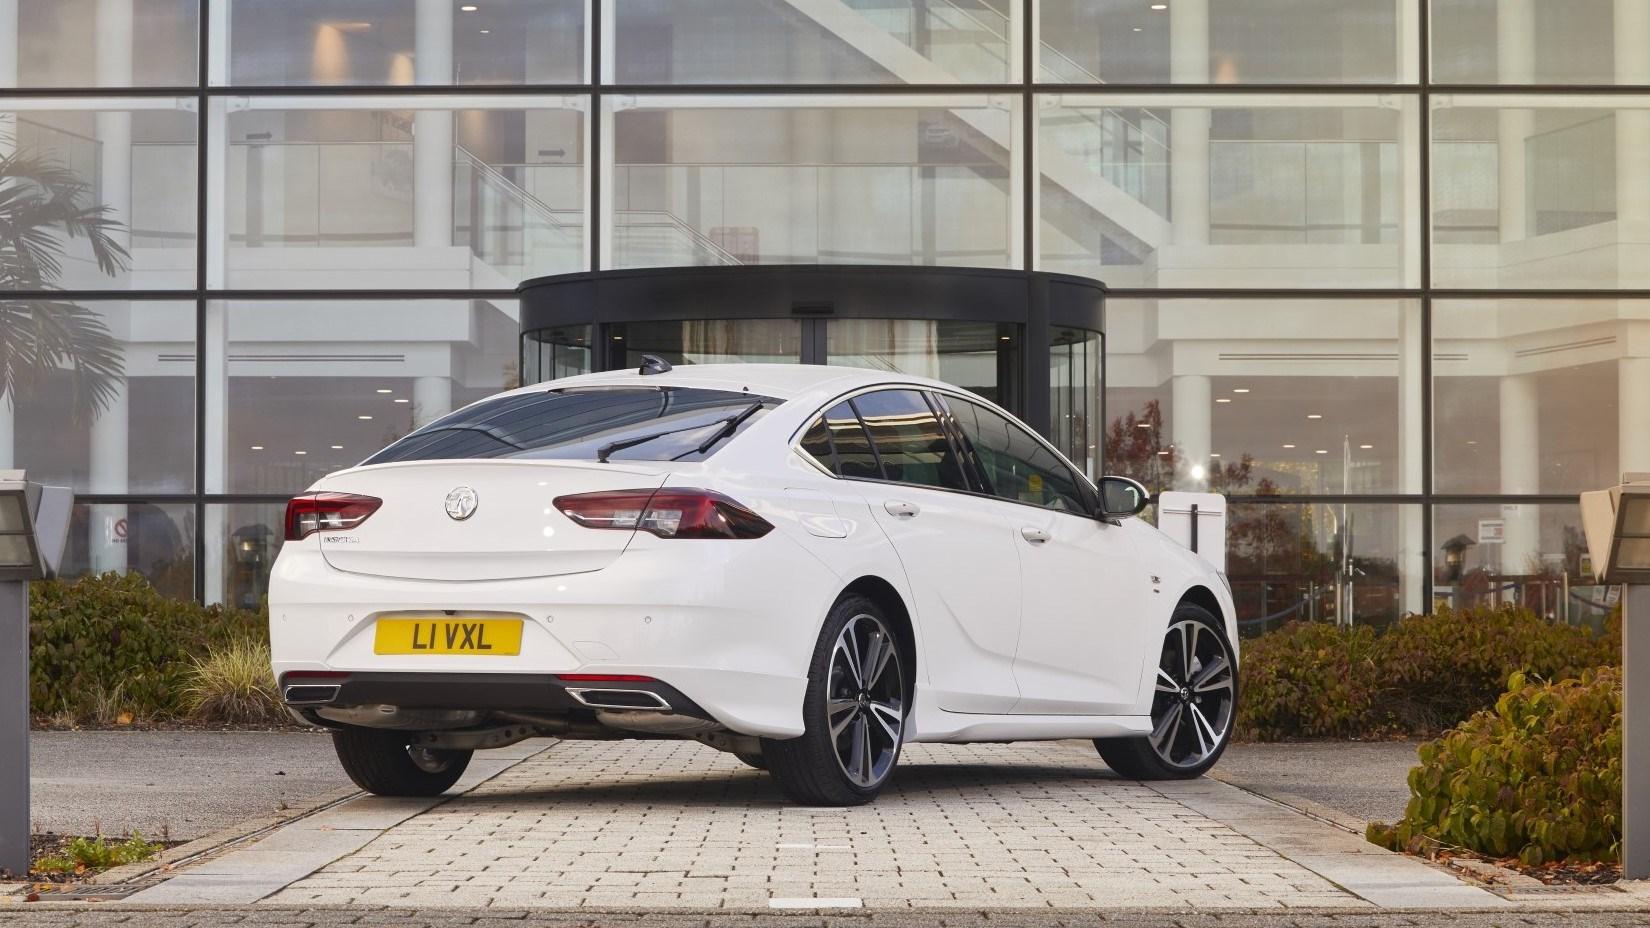 2021 Vauxhall Insignia - rear three quarter